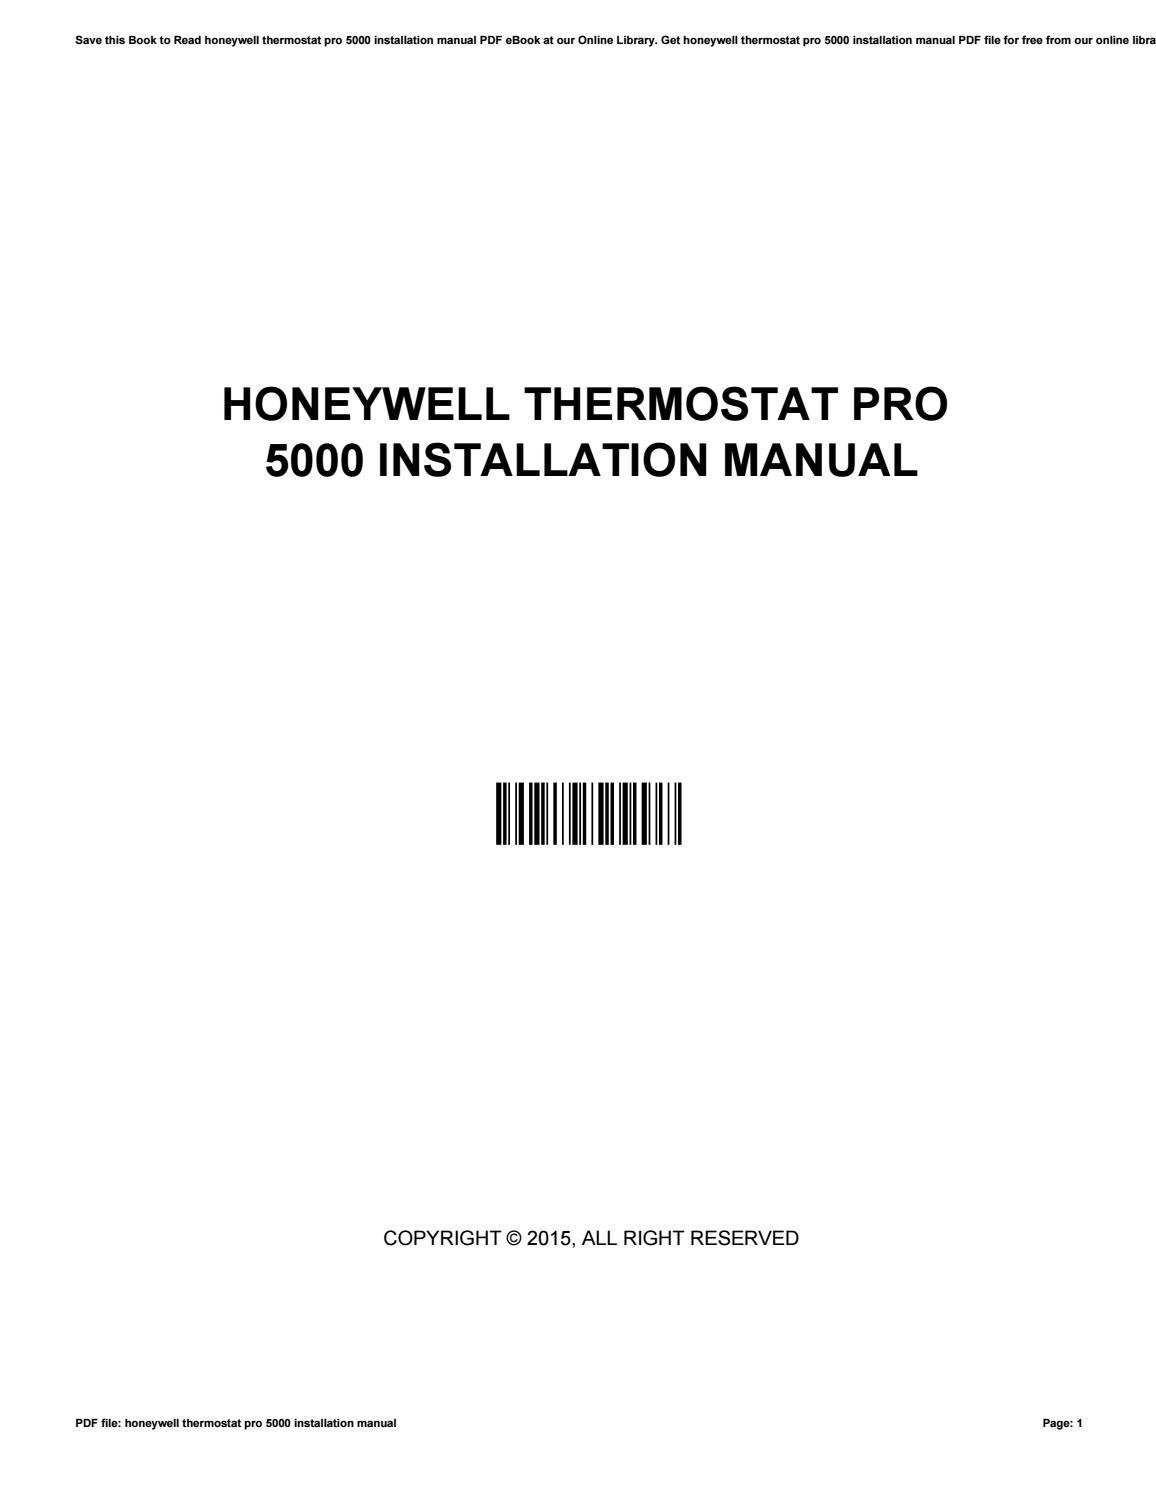 hight resolution of honeywell thermostat pro 5000 installation manual by jamiegorman3869 issuu